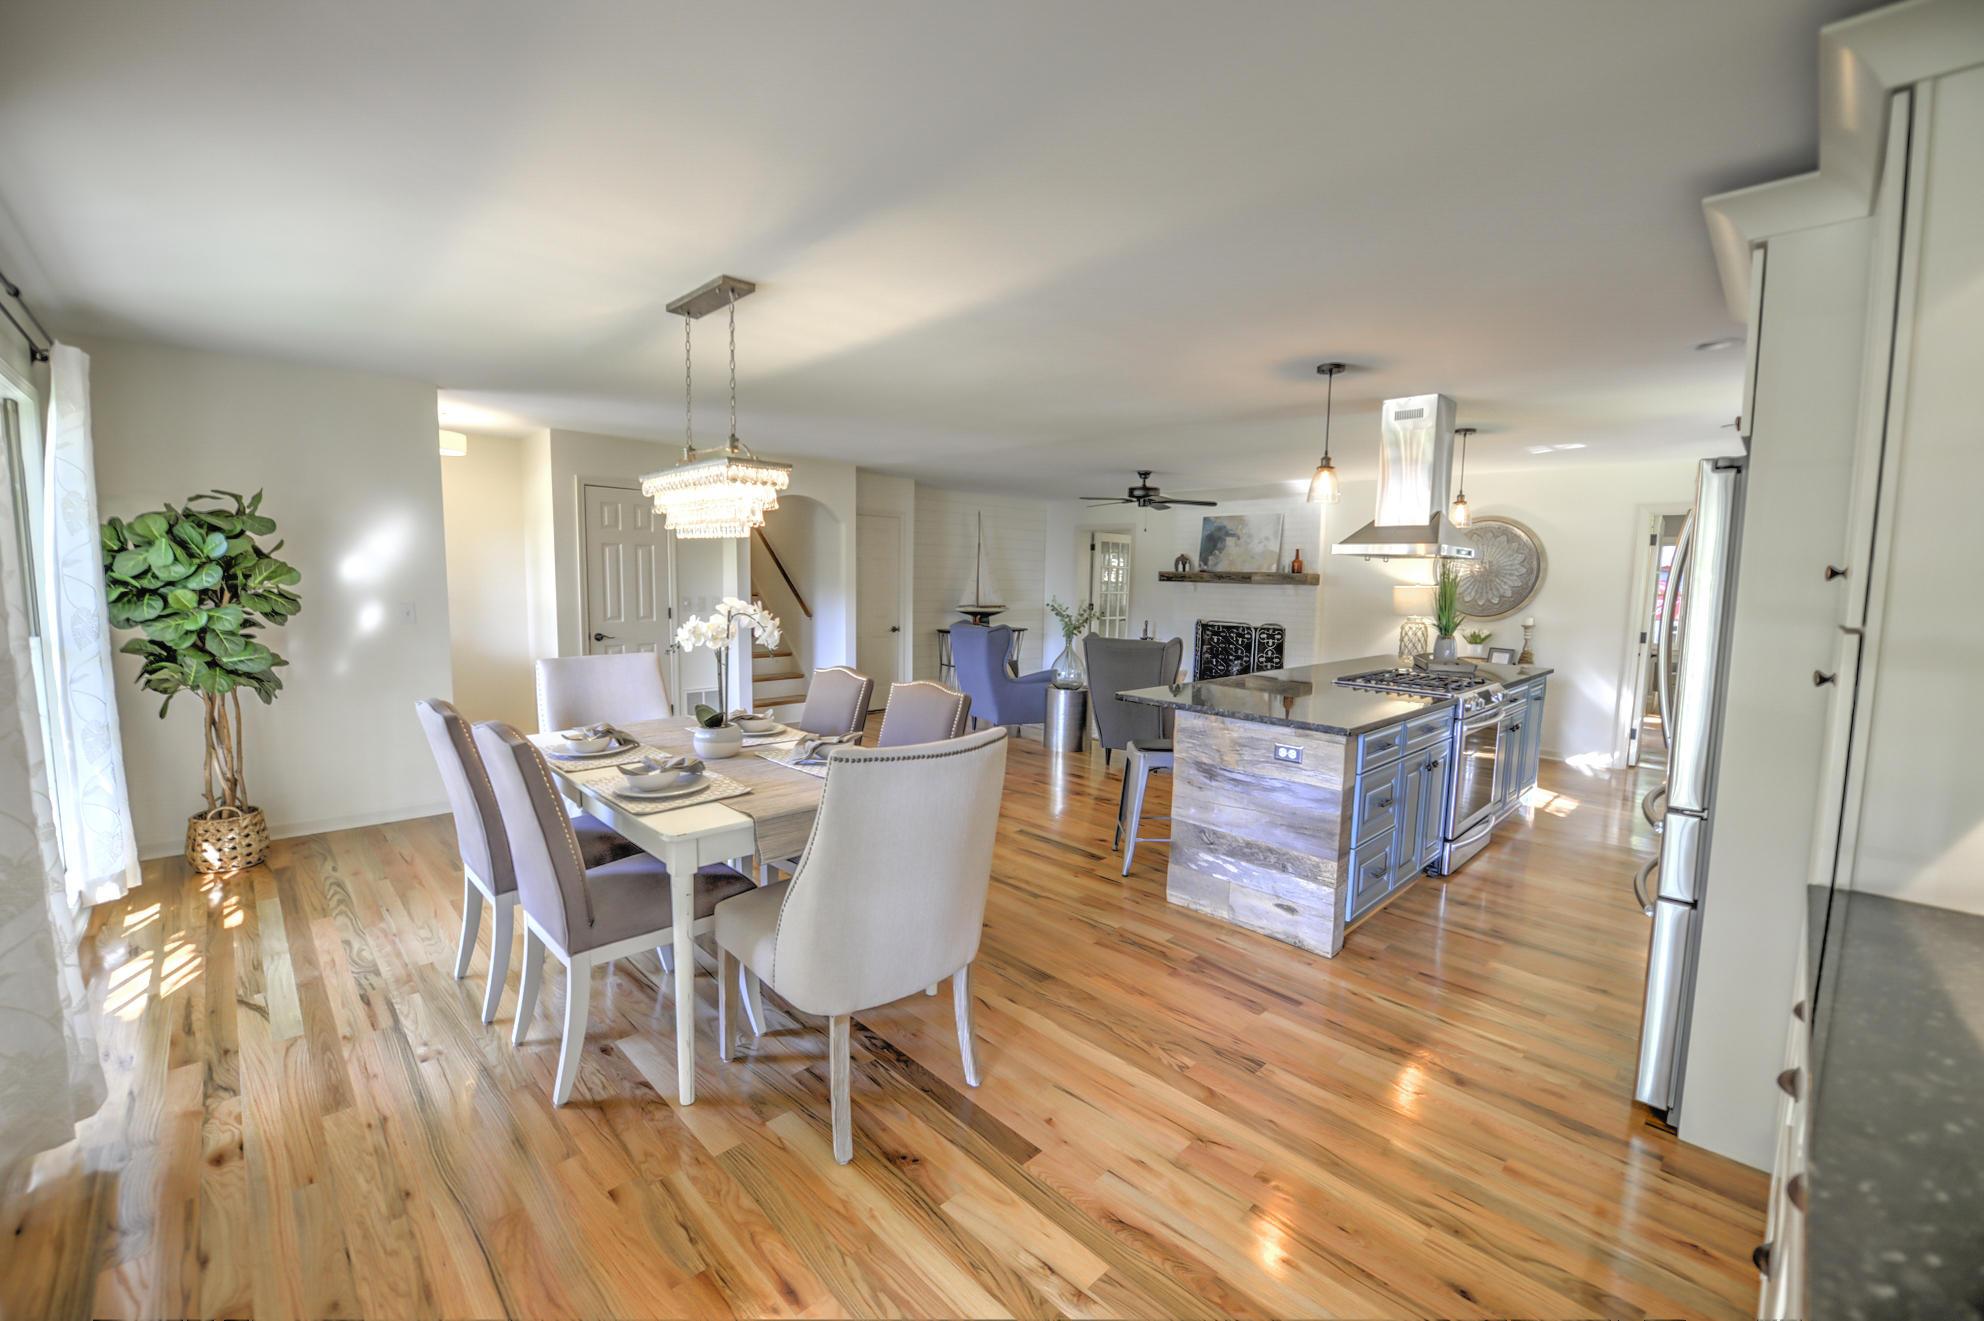 Shemwood II Homes For Sale - 1017 Jack Snipe, Mount Pleasant, SC - 11